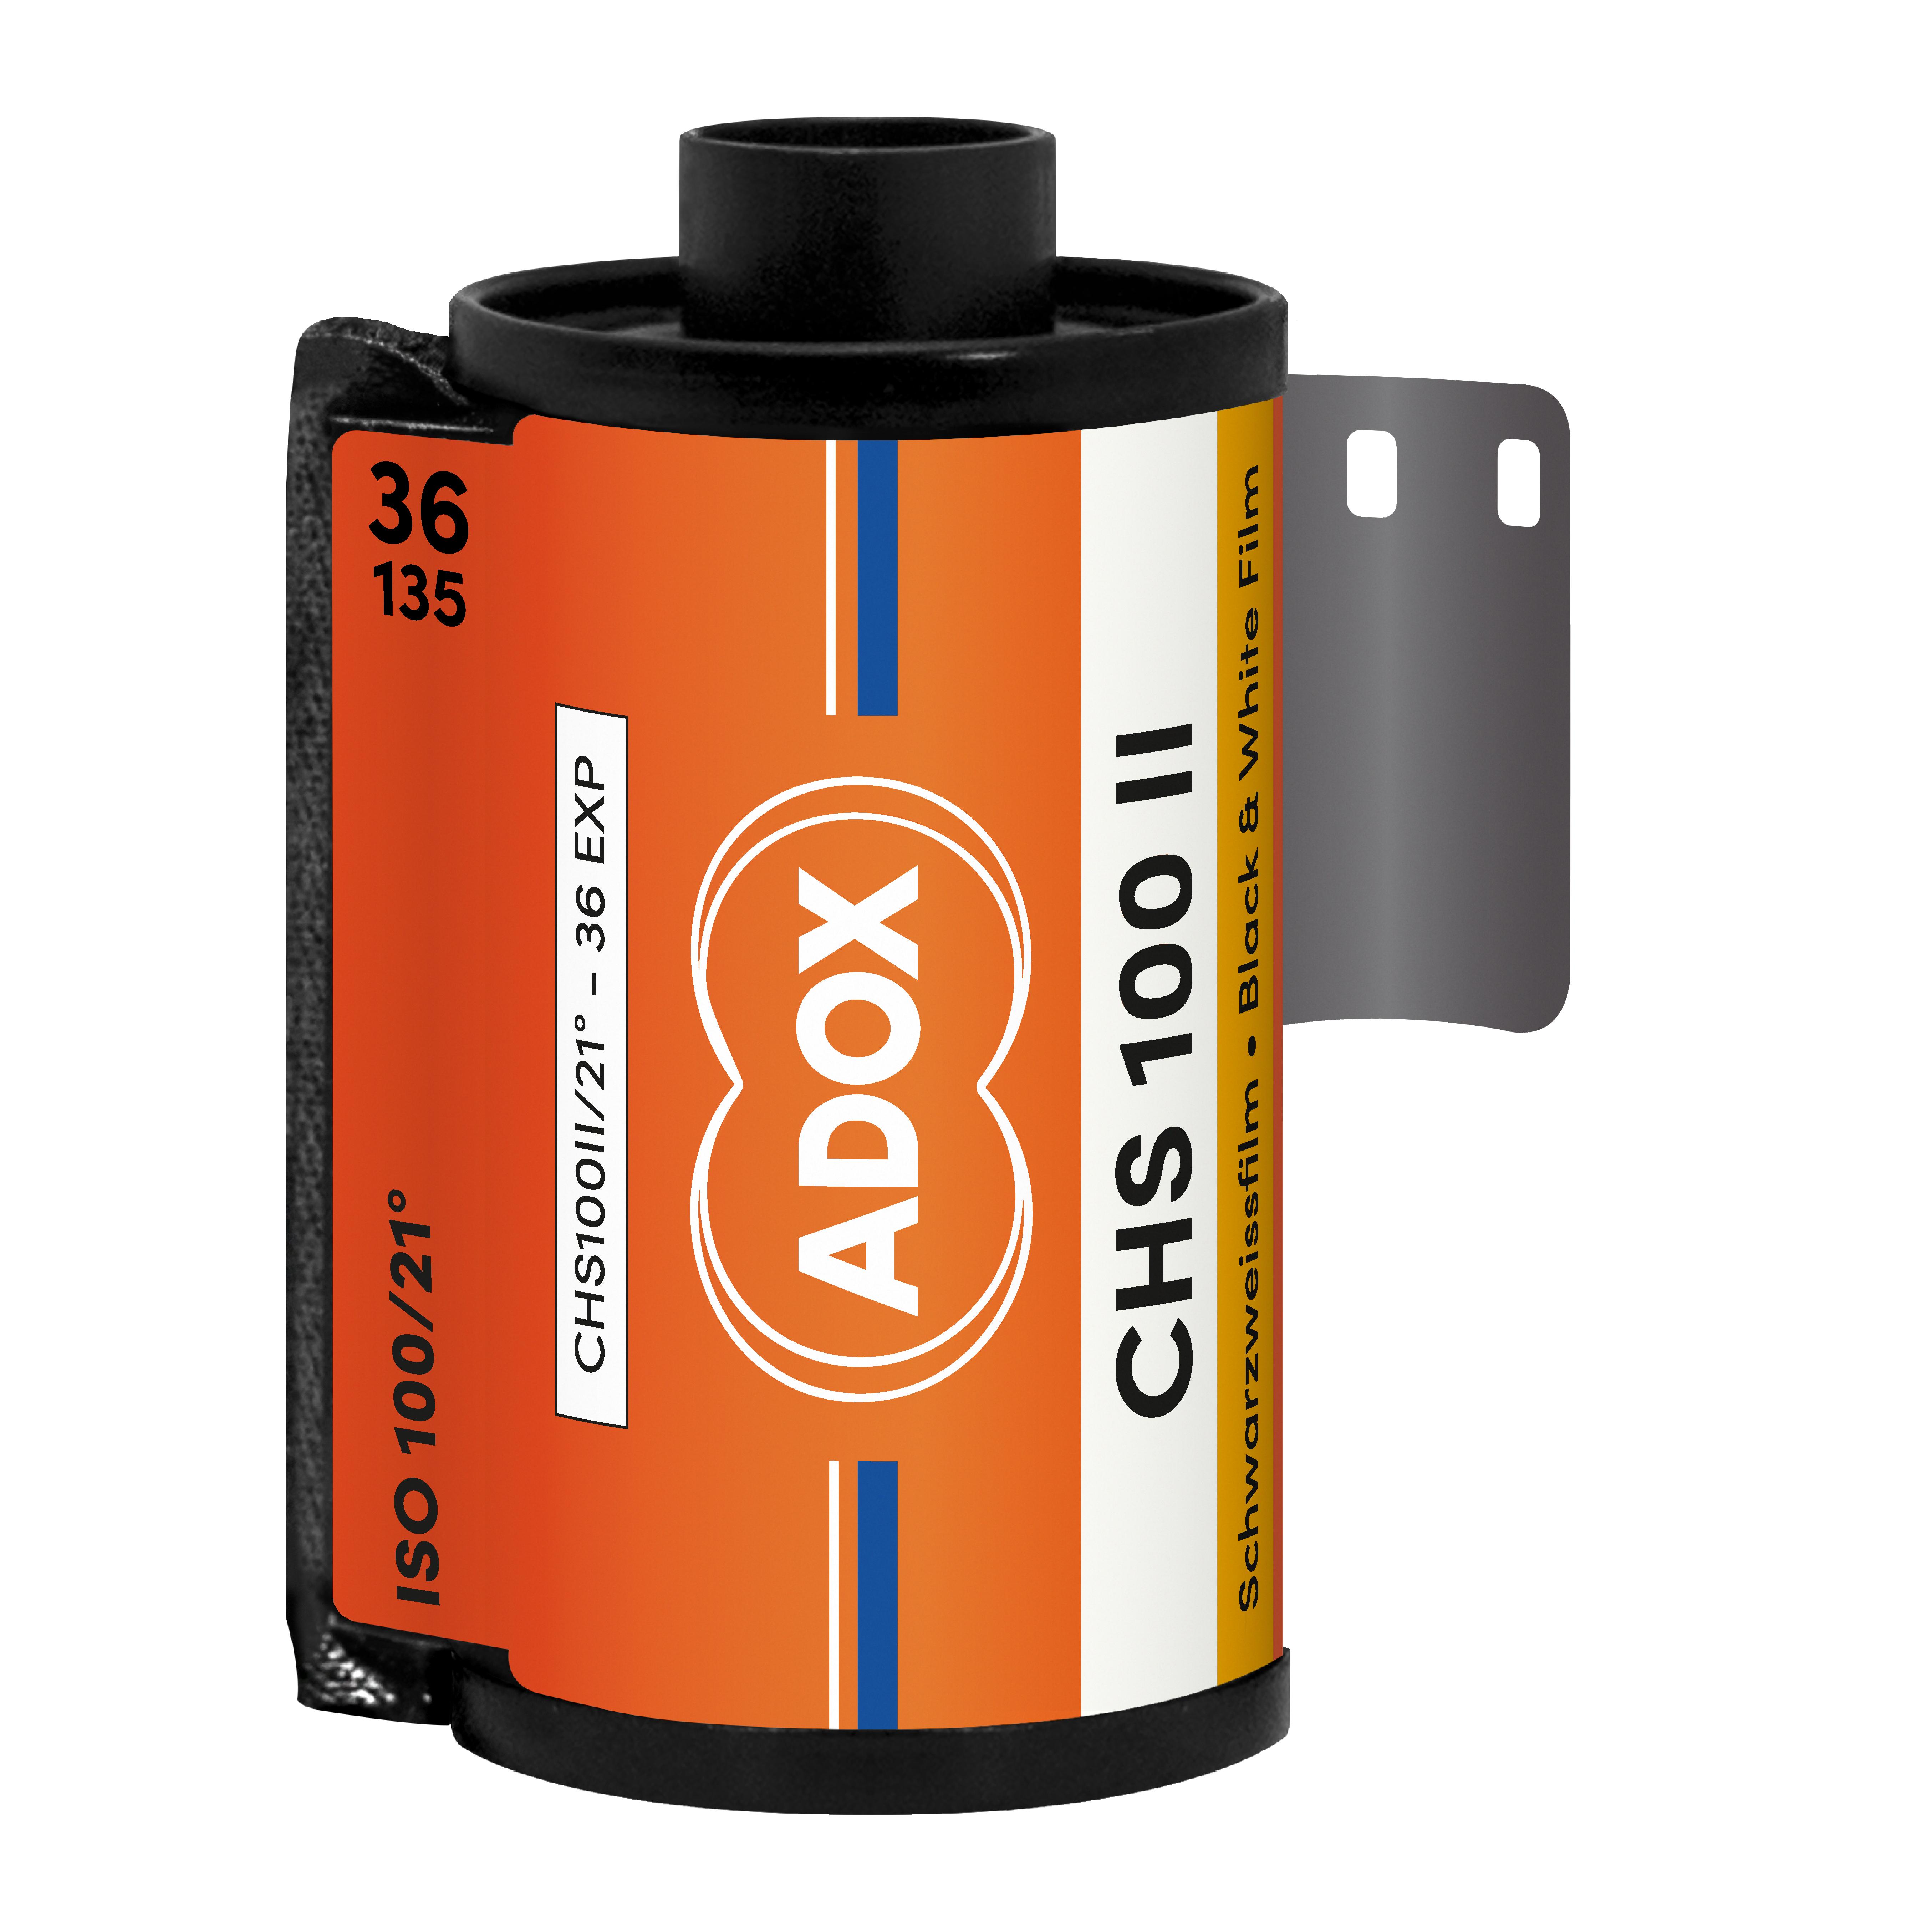 ADOX CHS 100 II/135-36